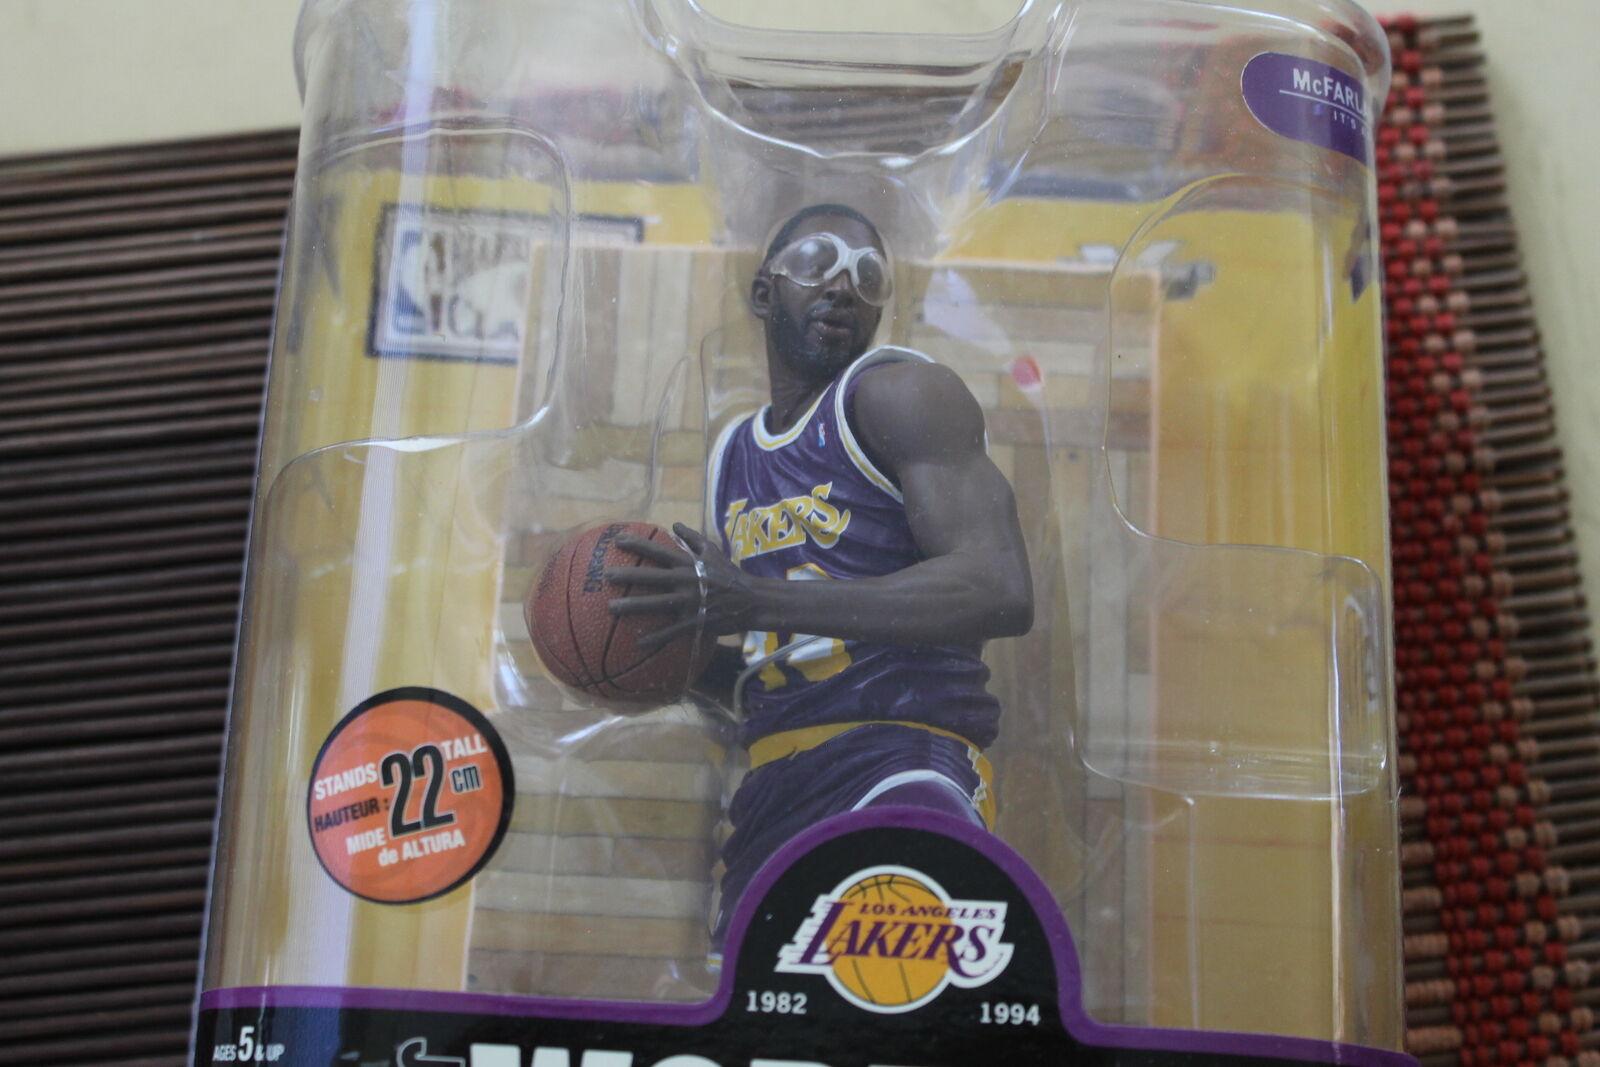 JAMES WORTHY, NBA LEGENDS 3, CHASE MCFARLANE, LOS ANGELES LAKERS